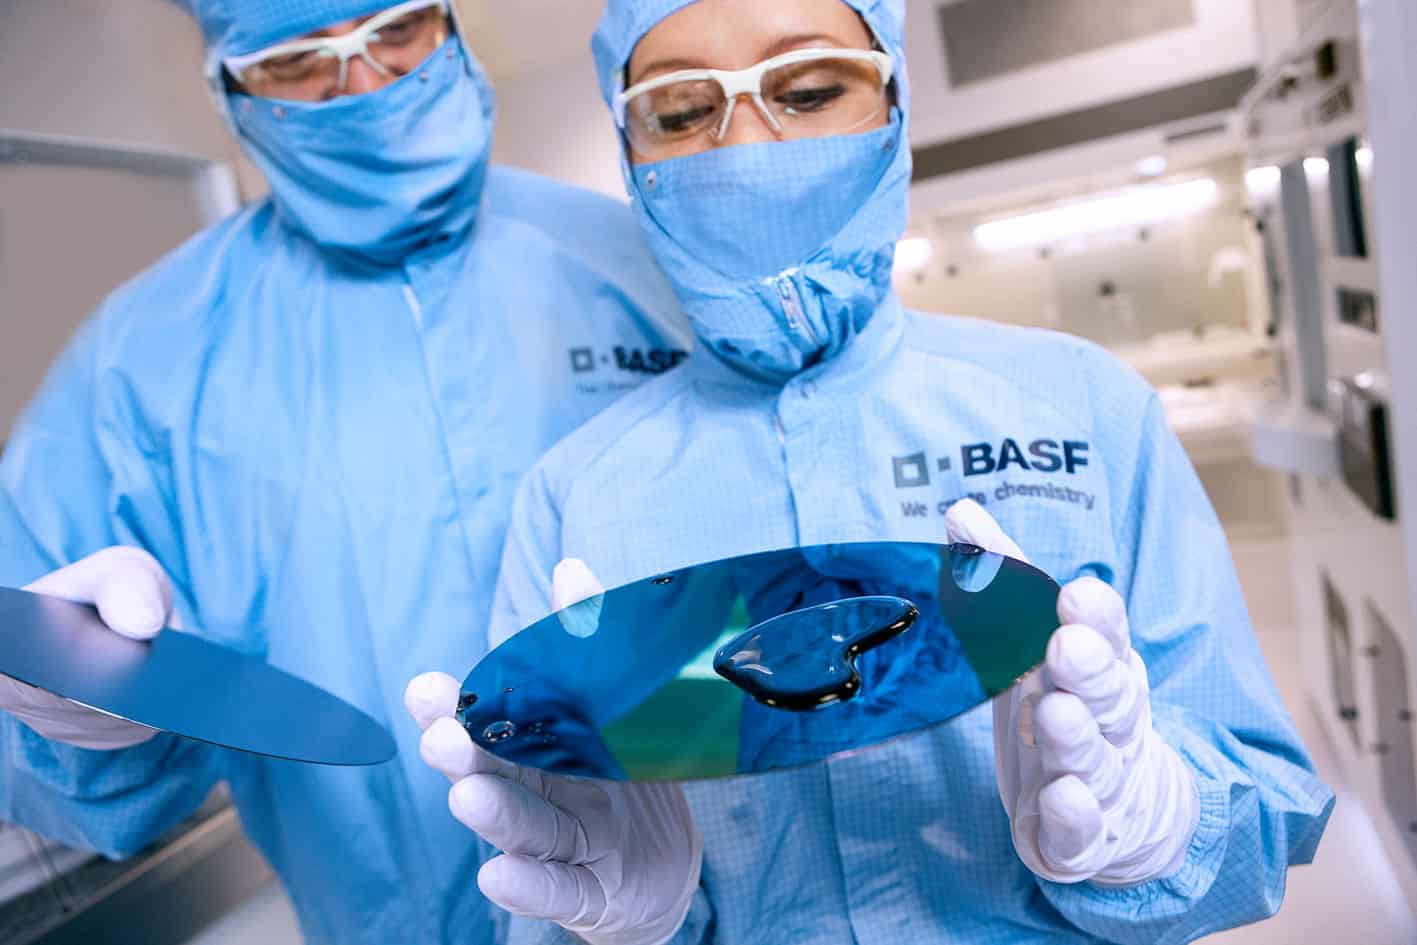 BASF Chemiker